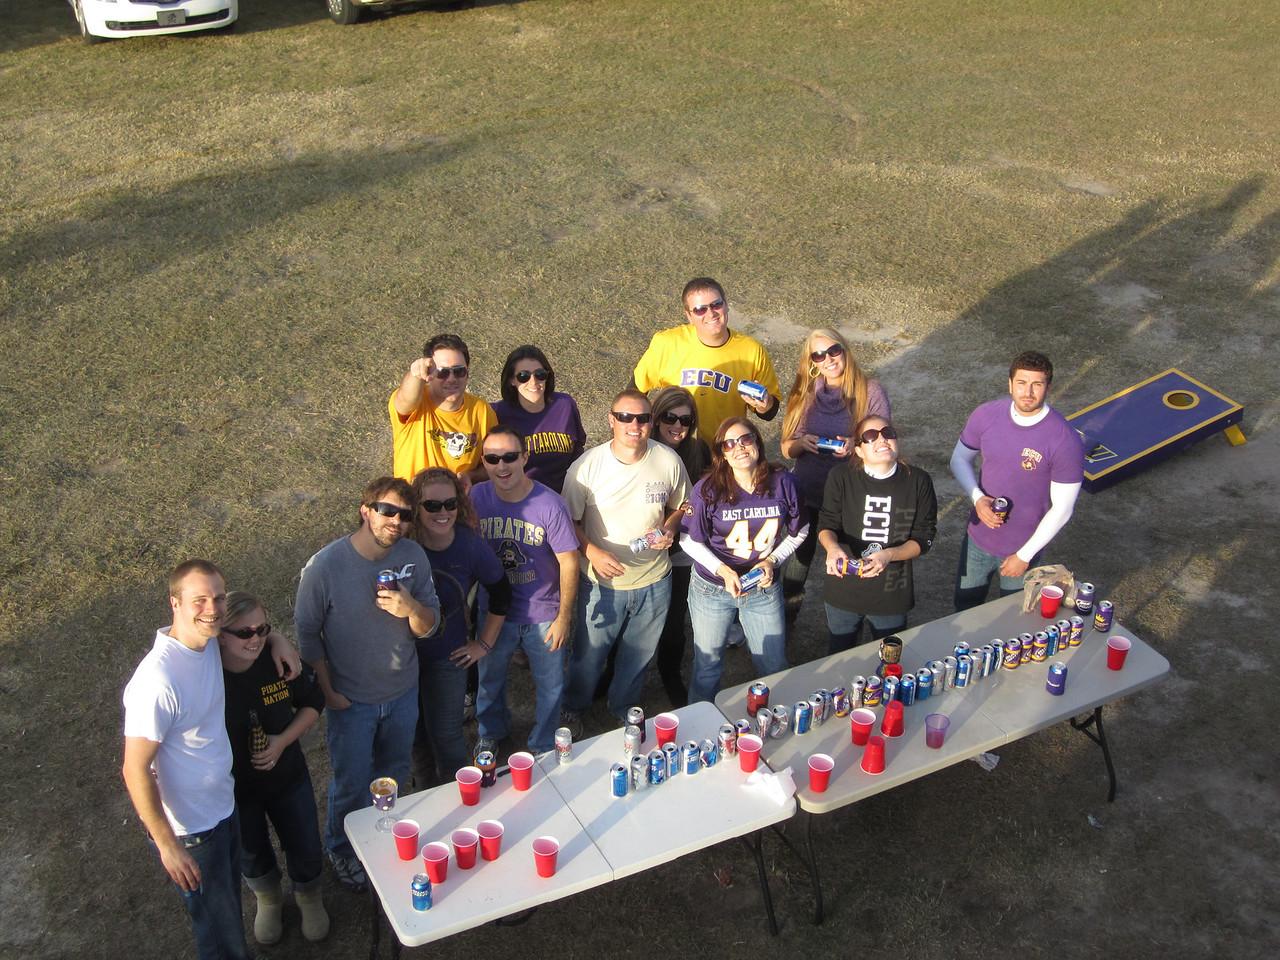 11/19/2011 ECU vs University of Central Florida - Flip cup game